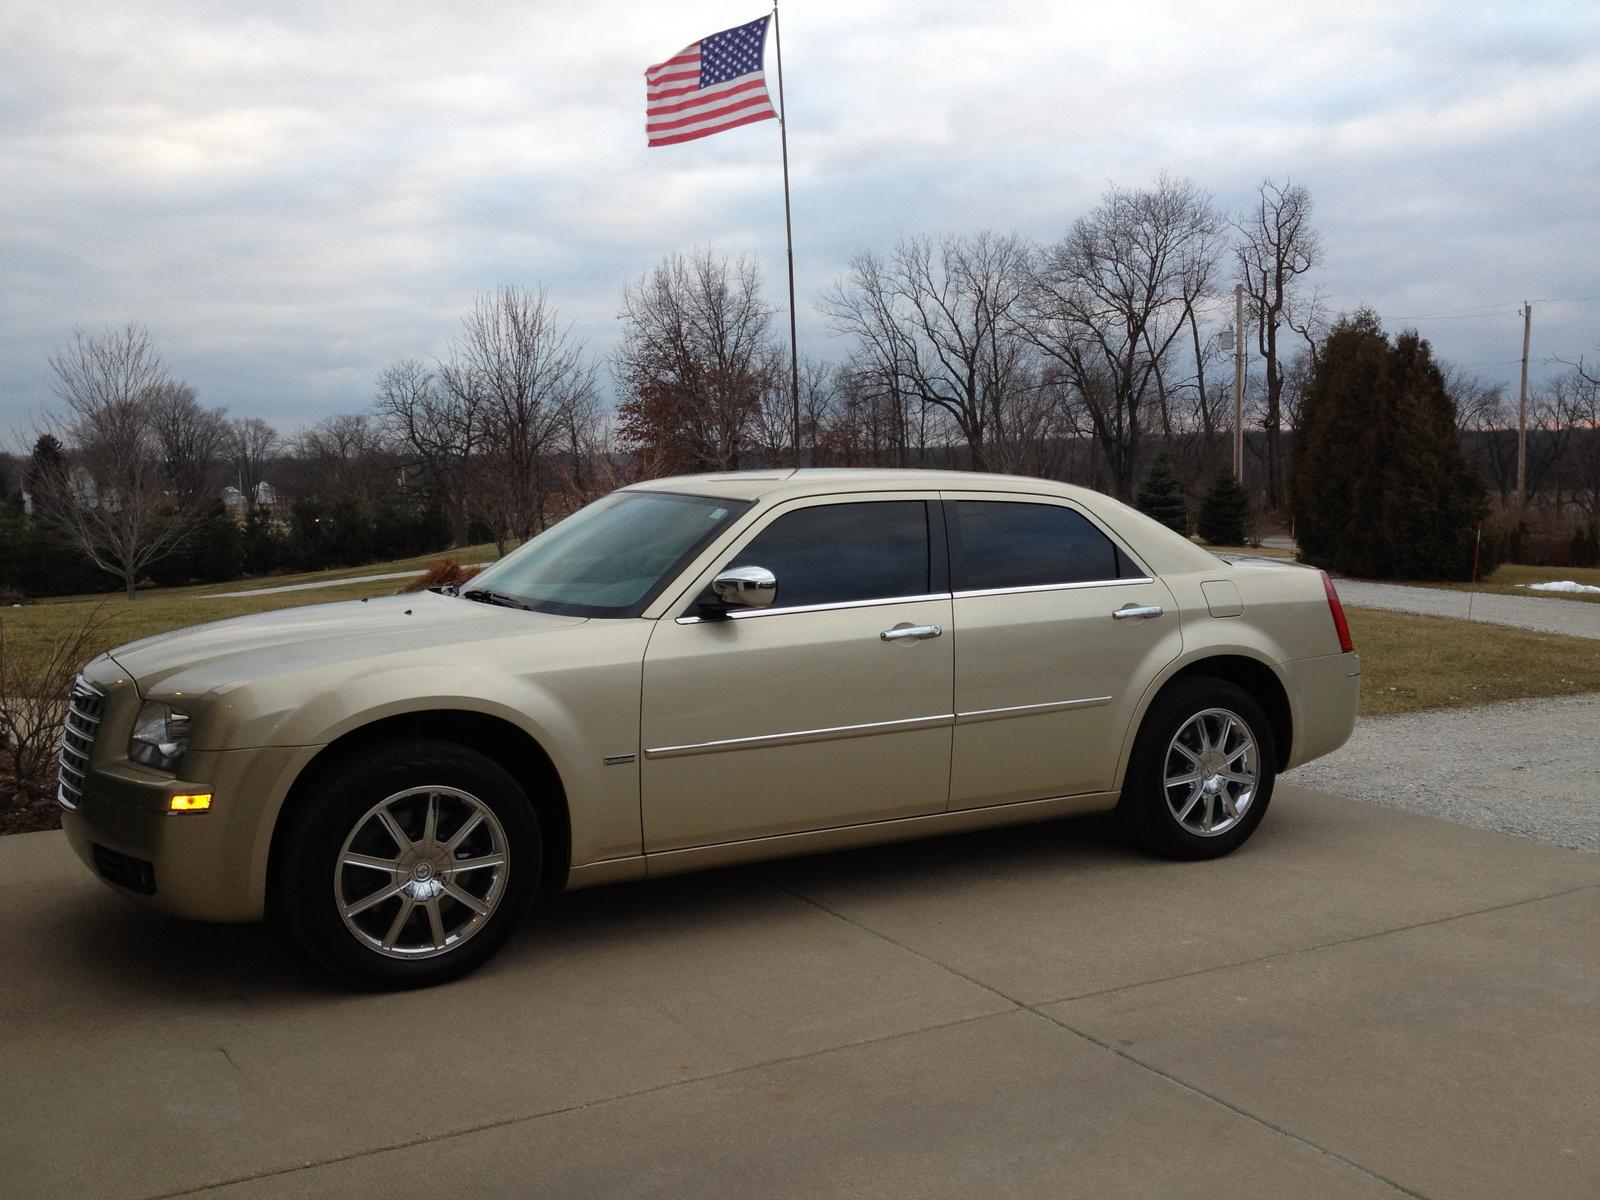 2010 Chrysler 300 Pictures Cargurus